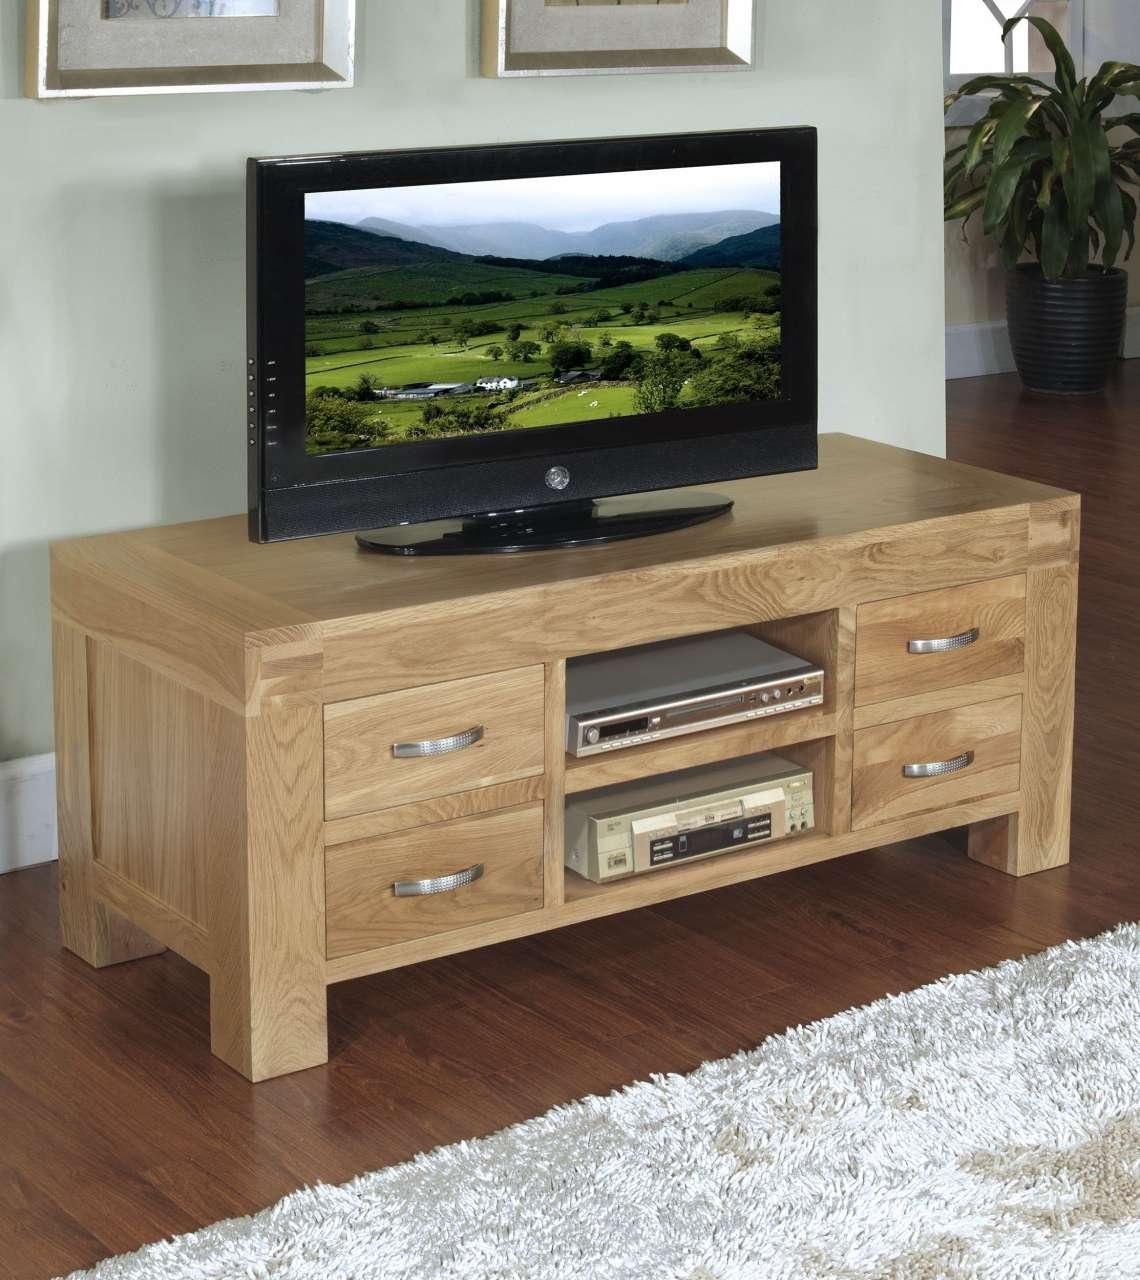 Rivermead Solid Oak Modern Furniture Widescreen Tv Cabinet Stand Regarding Widescreen Tv Stands (View 3 of 15)